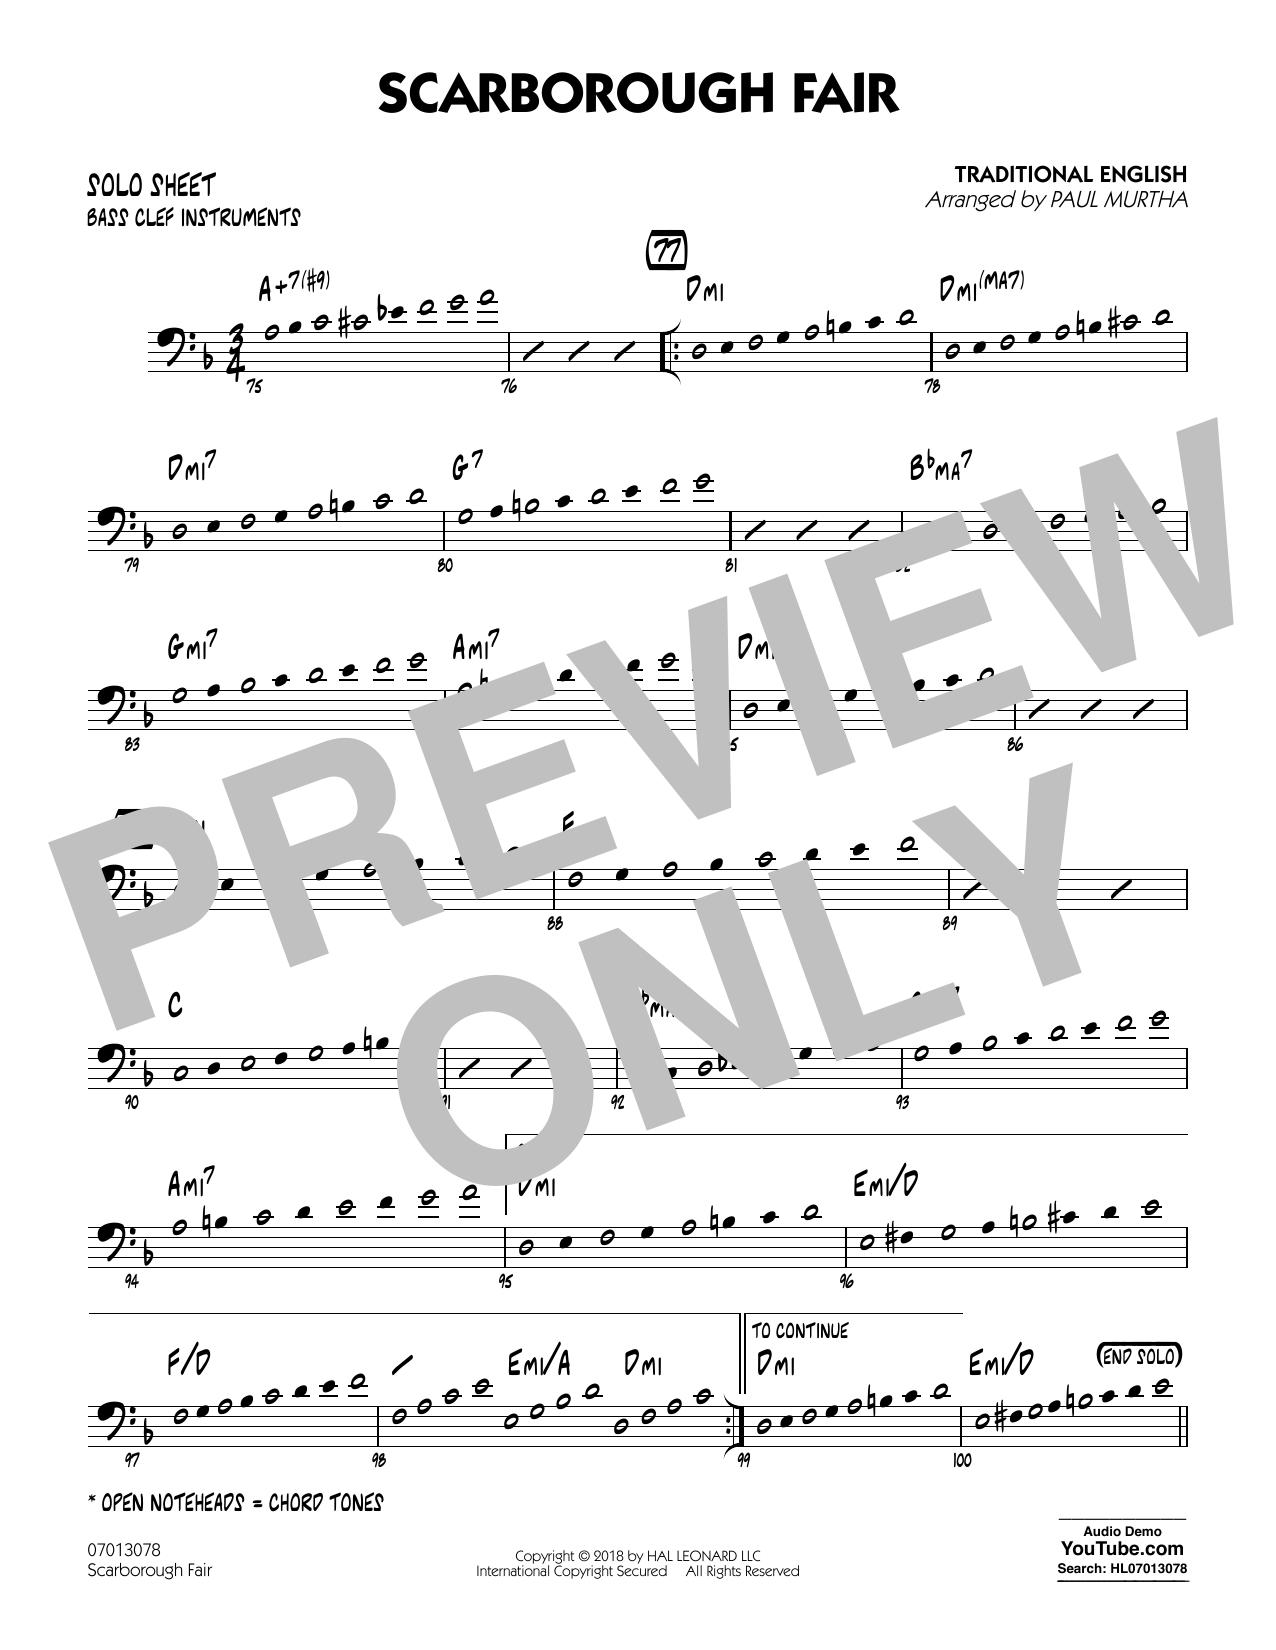 Paul Murtha Scarborough Fair - Bass Clef Solo Sheet sheet music notes printable PDF score